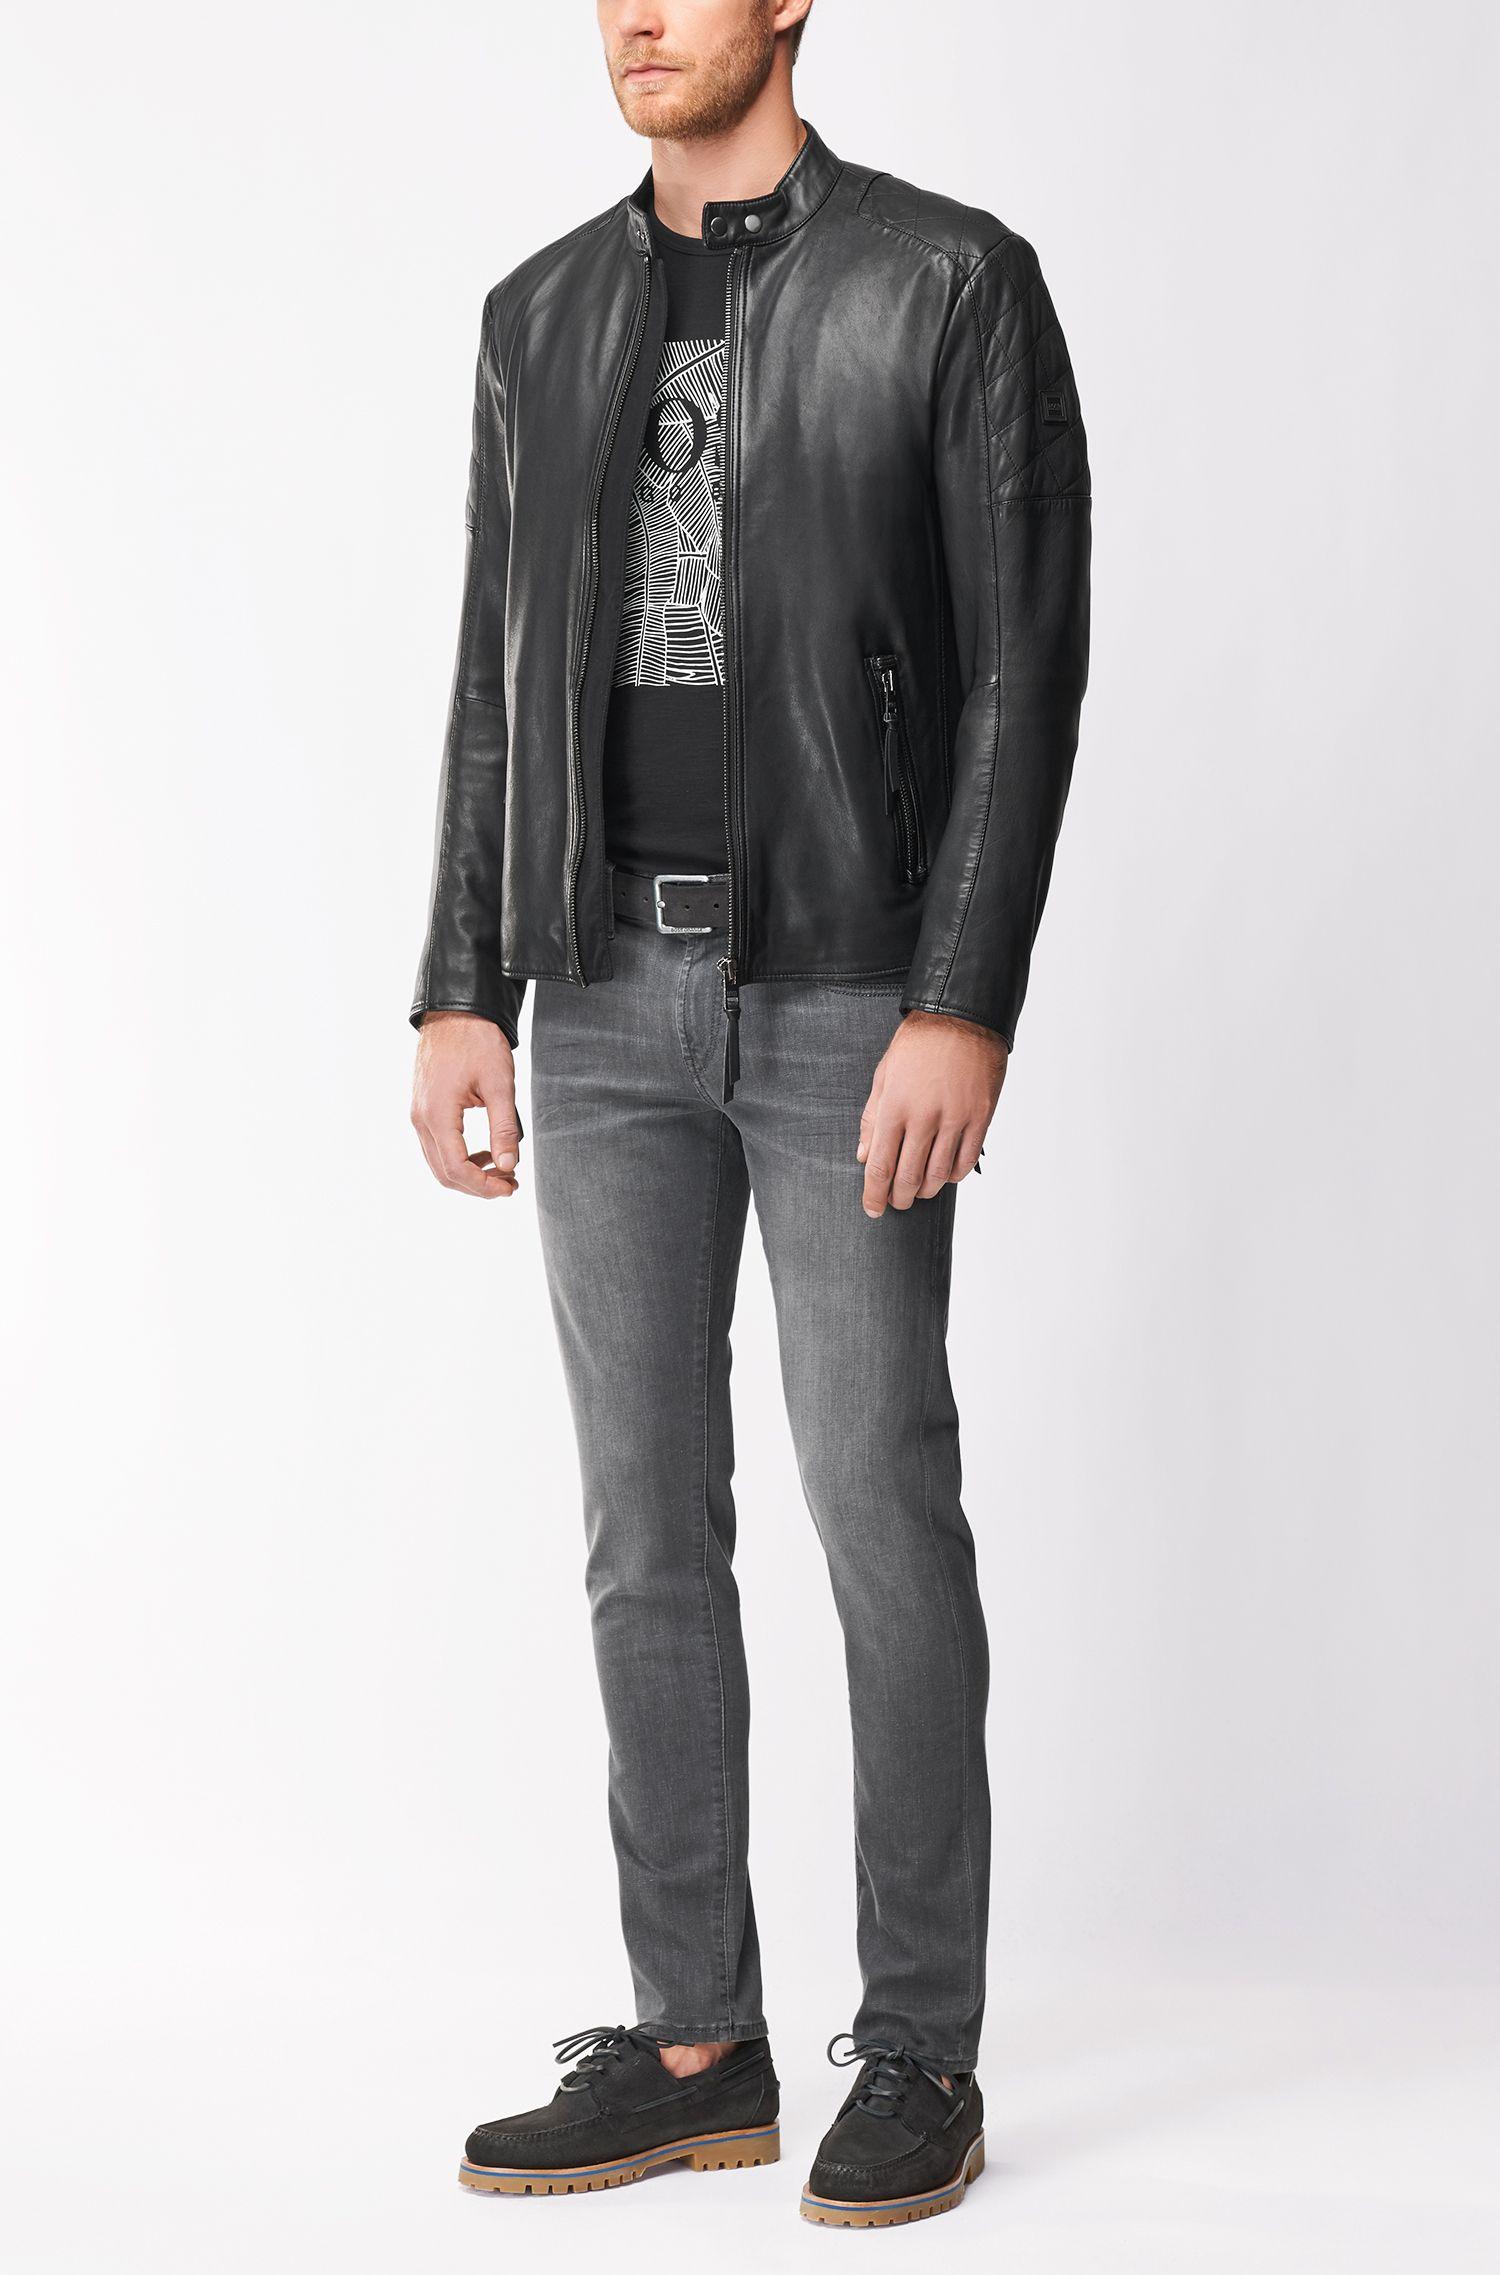 Sheepskin Leather Jacket | Jeepo